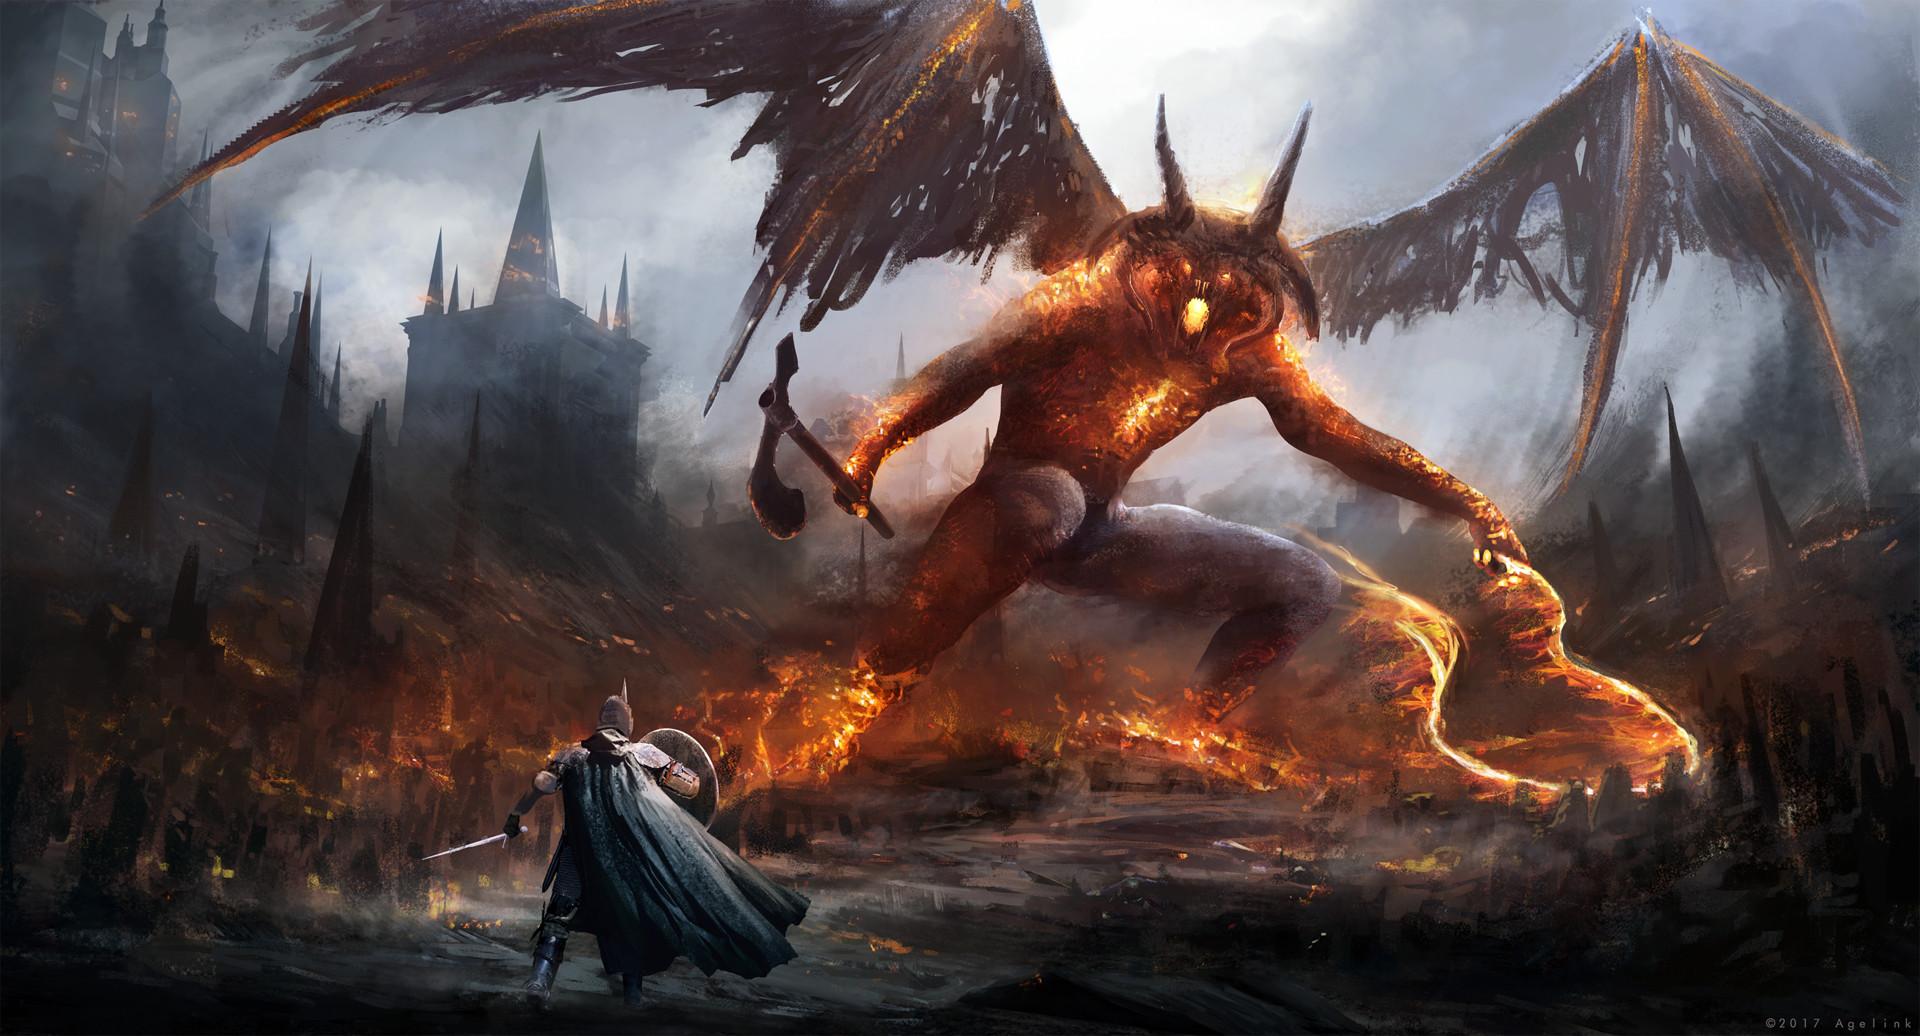 Elvish Lord Of The Rings Gothmog vs Ecthelion, ...